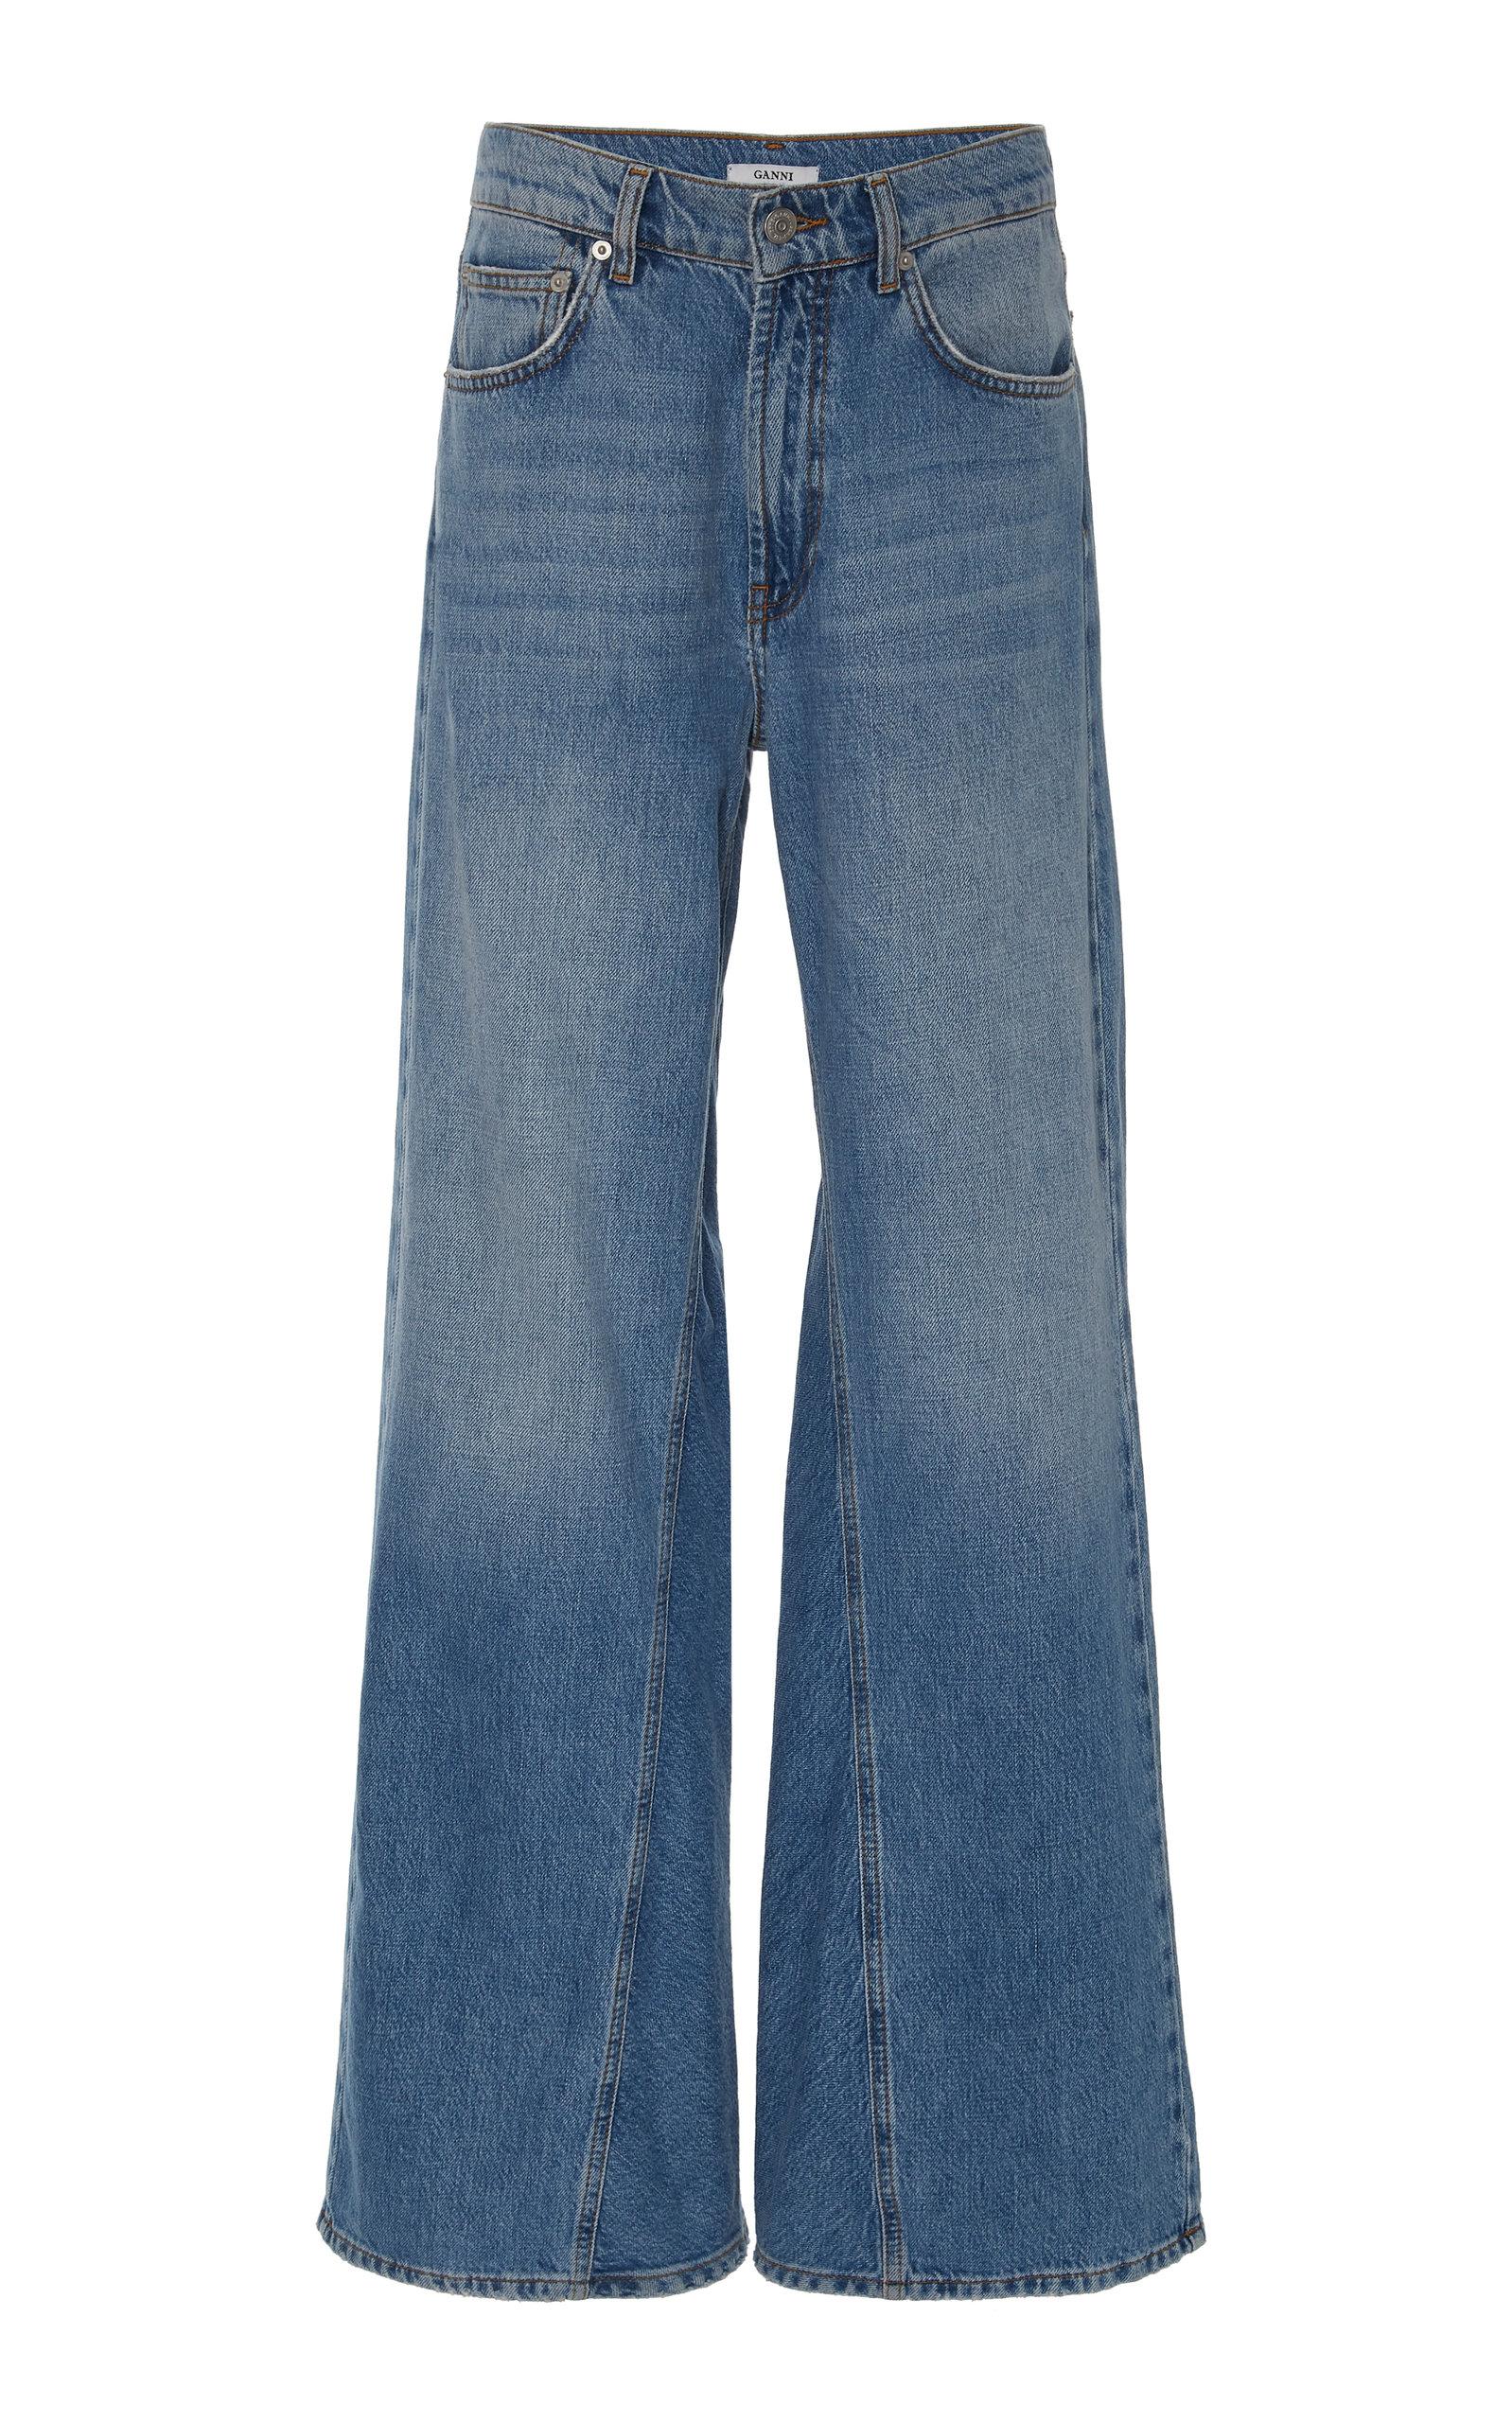 Ganni Jeans HIGH-RISE WIDE-LEG JEANS